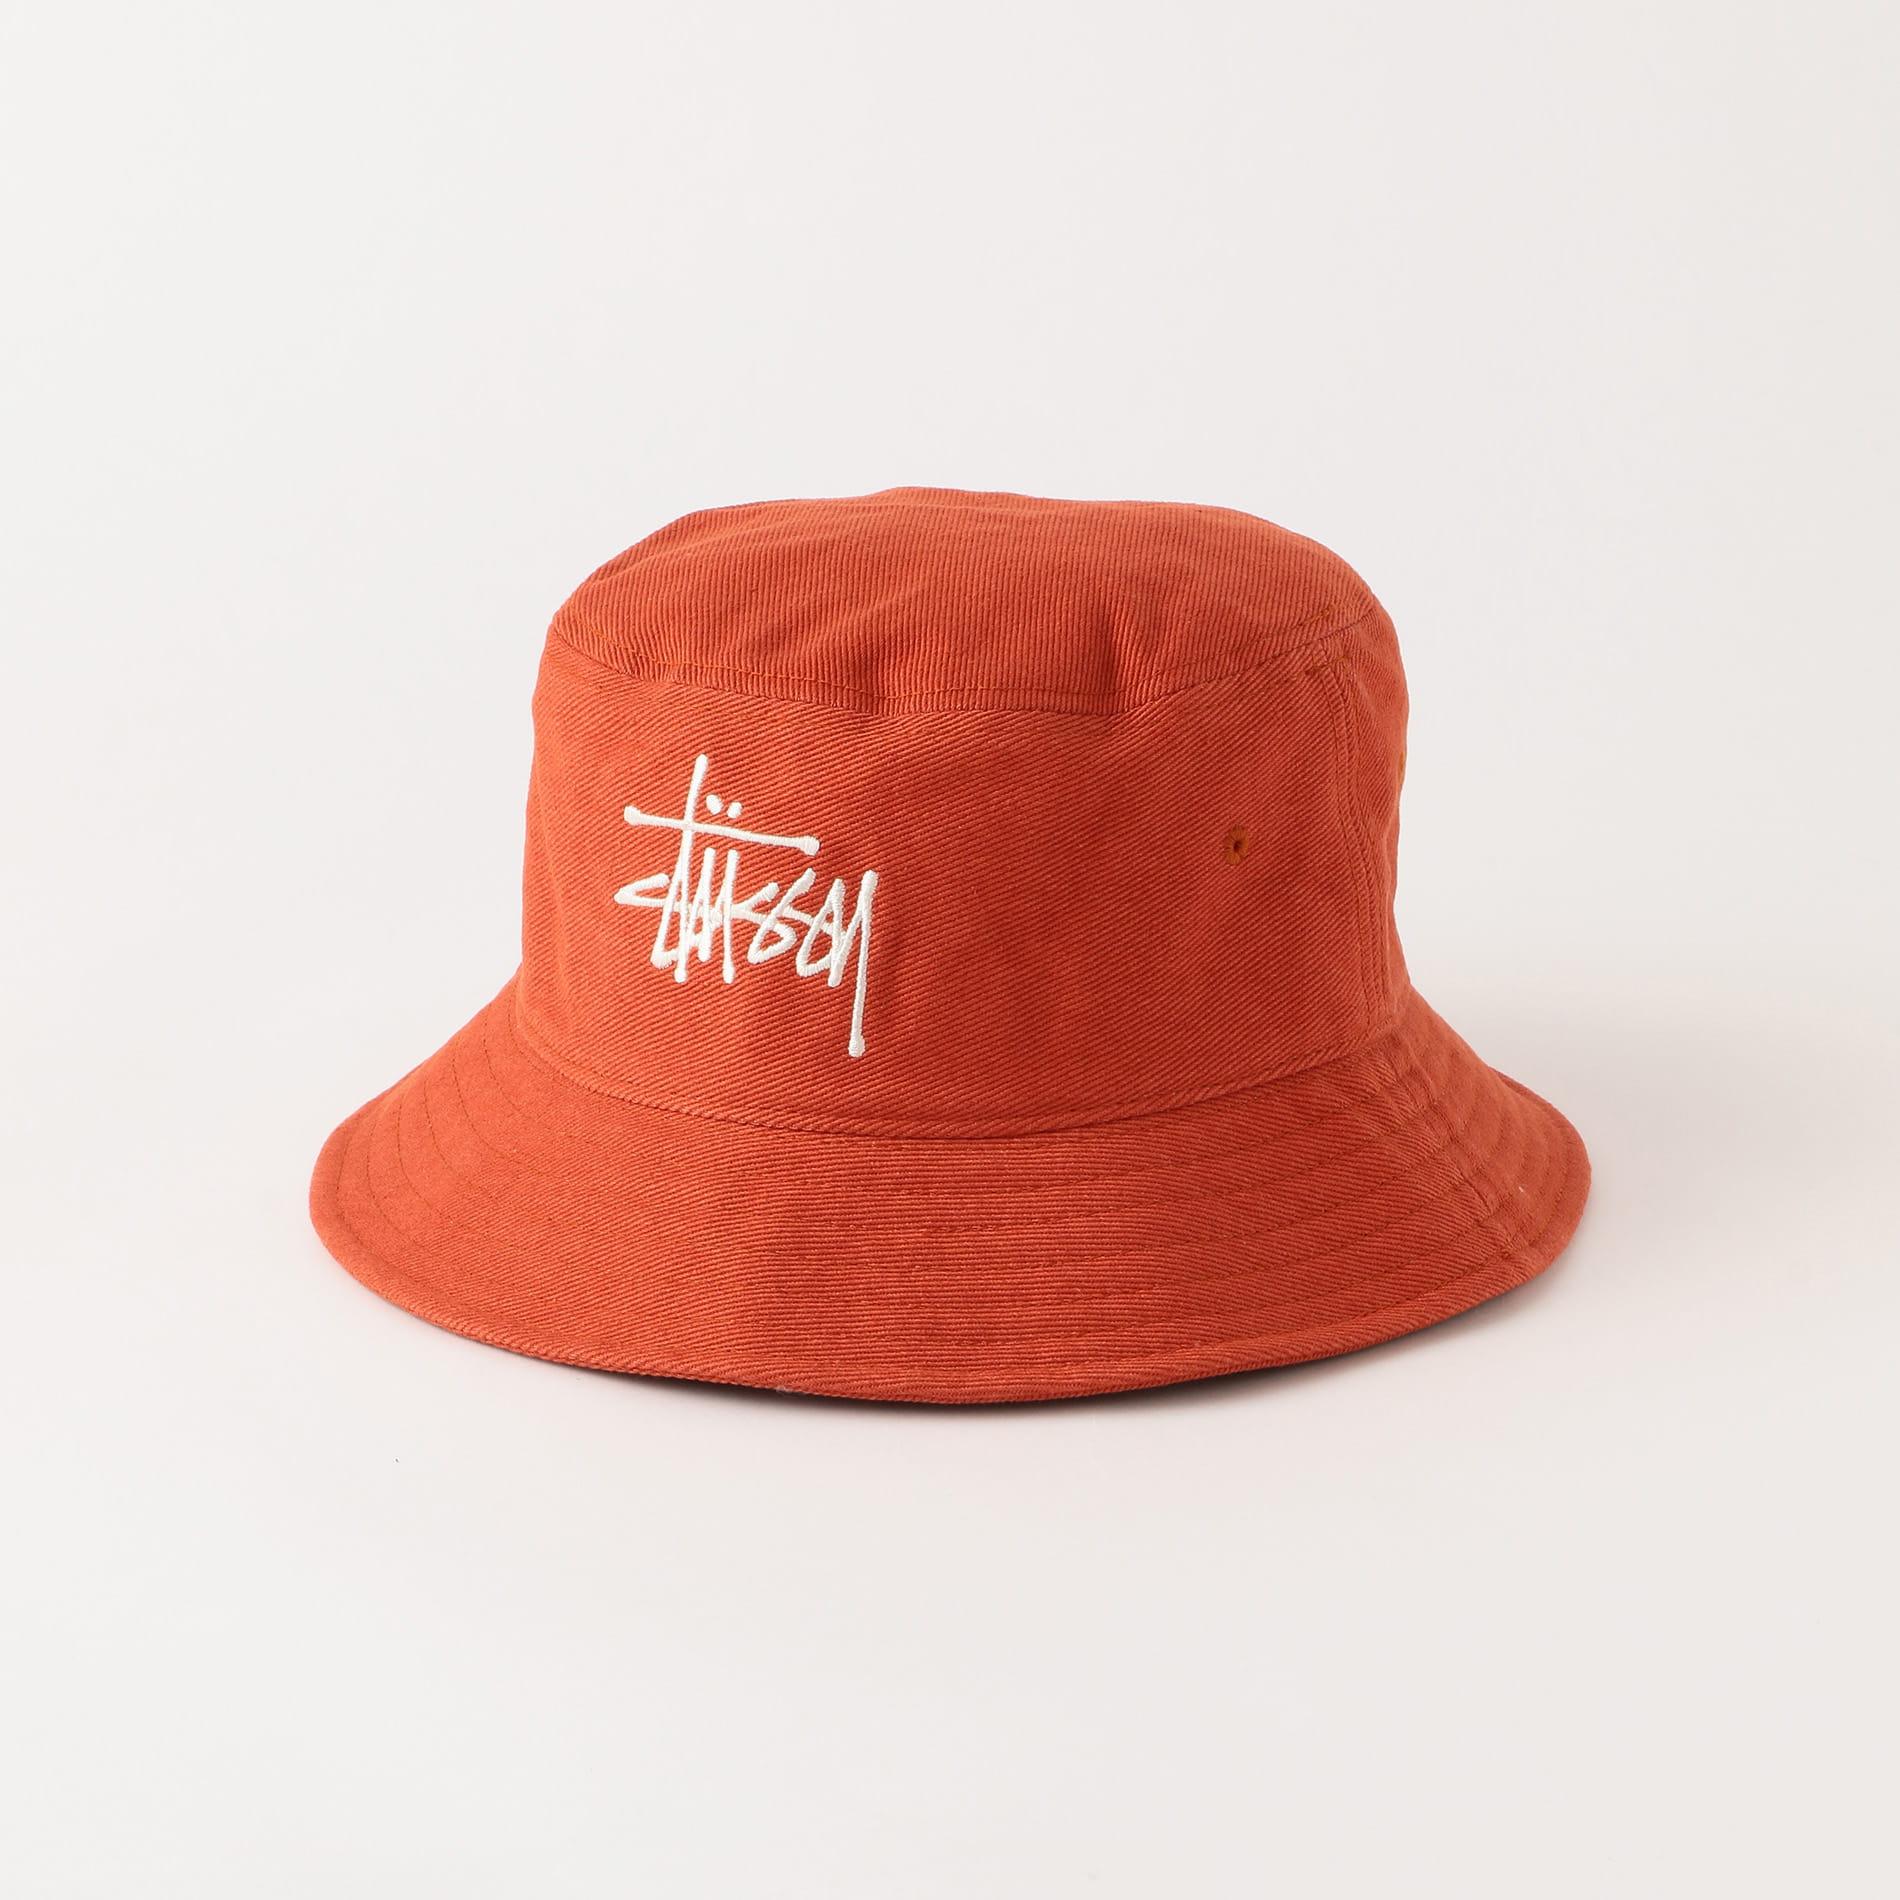 【Stussy】MEN ハット Big Logo Twill Bucket Hat 1321024